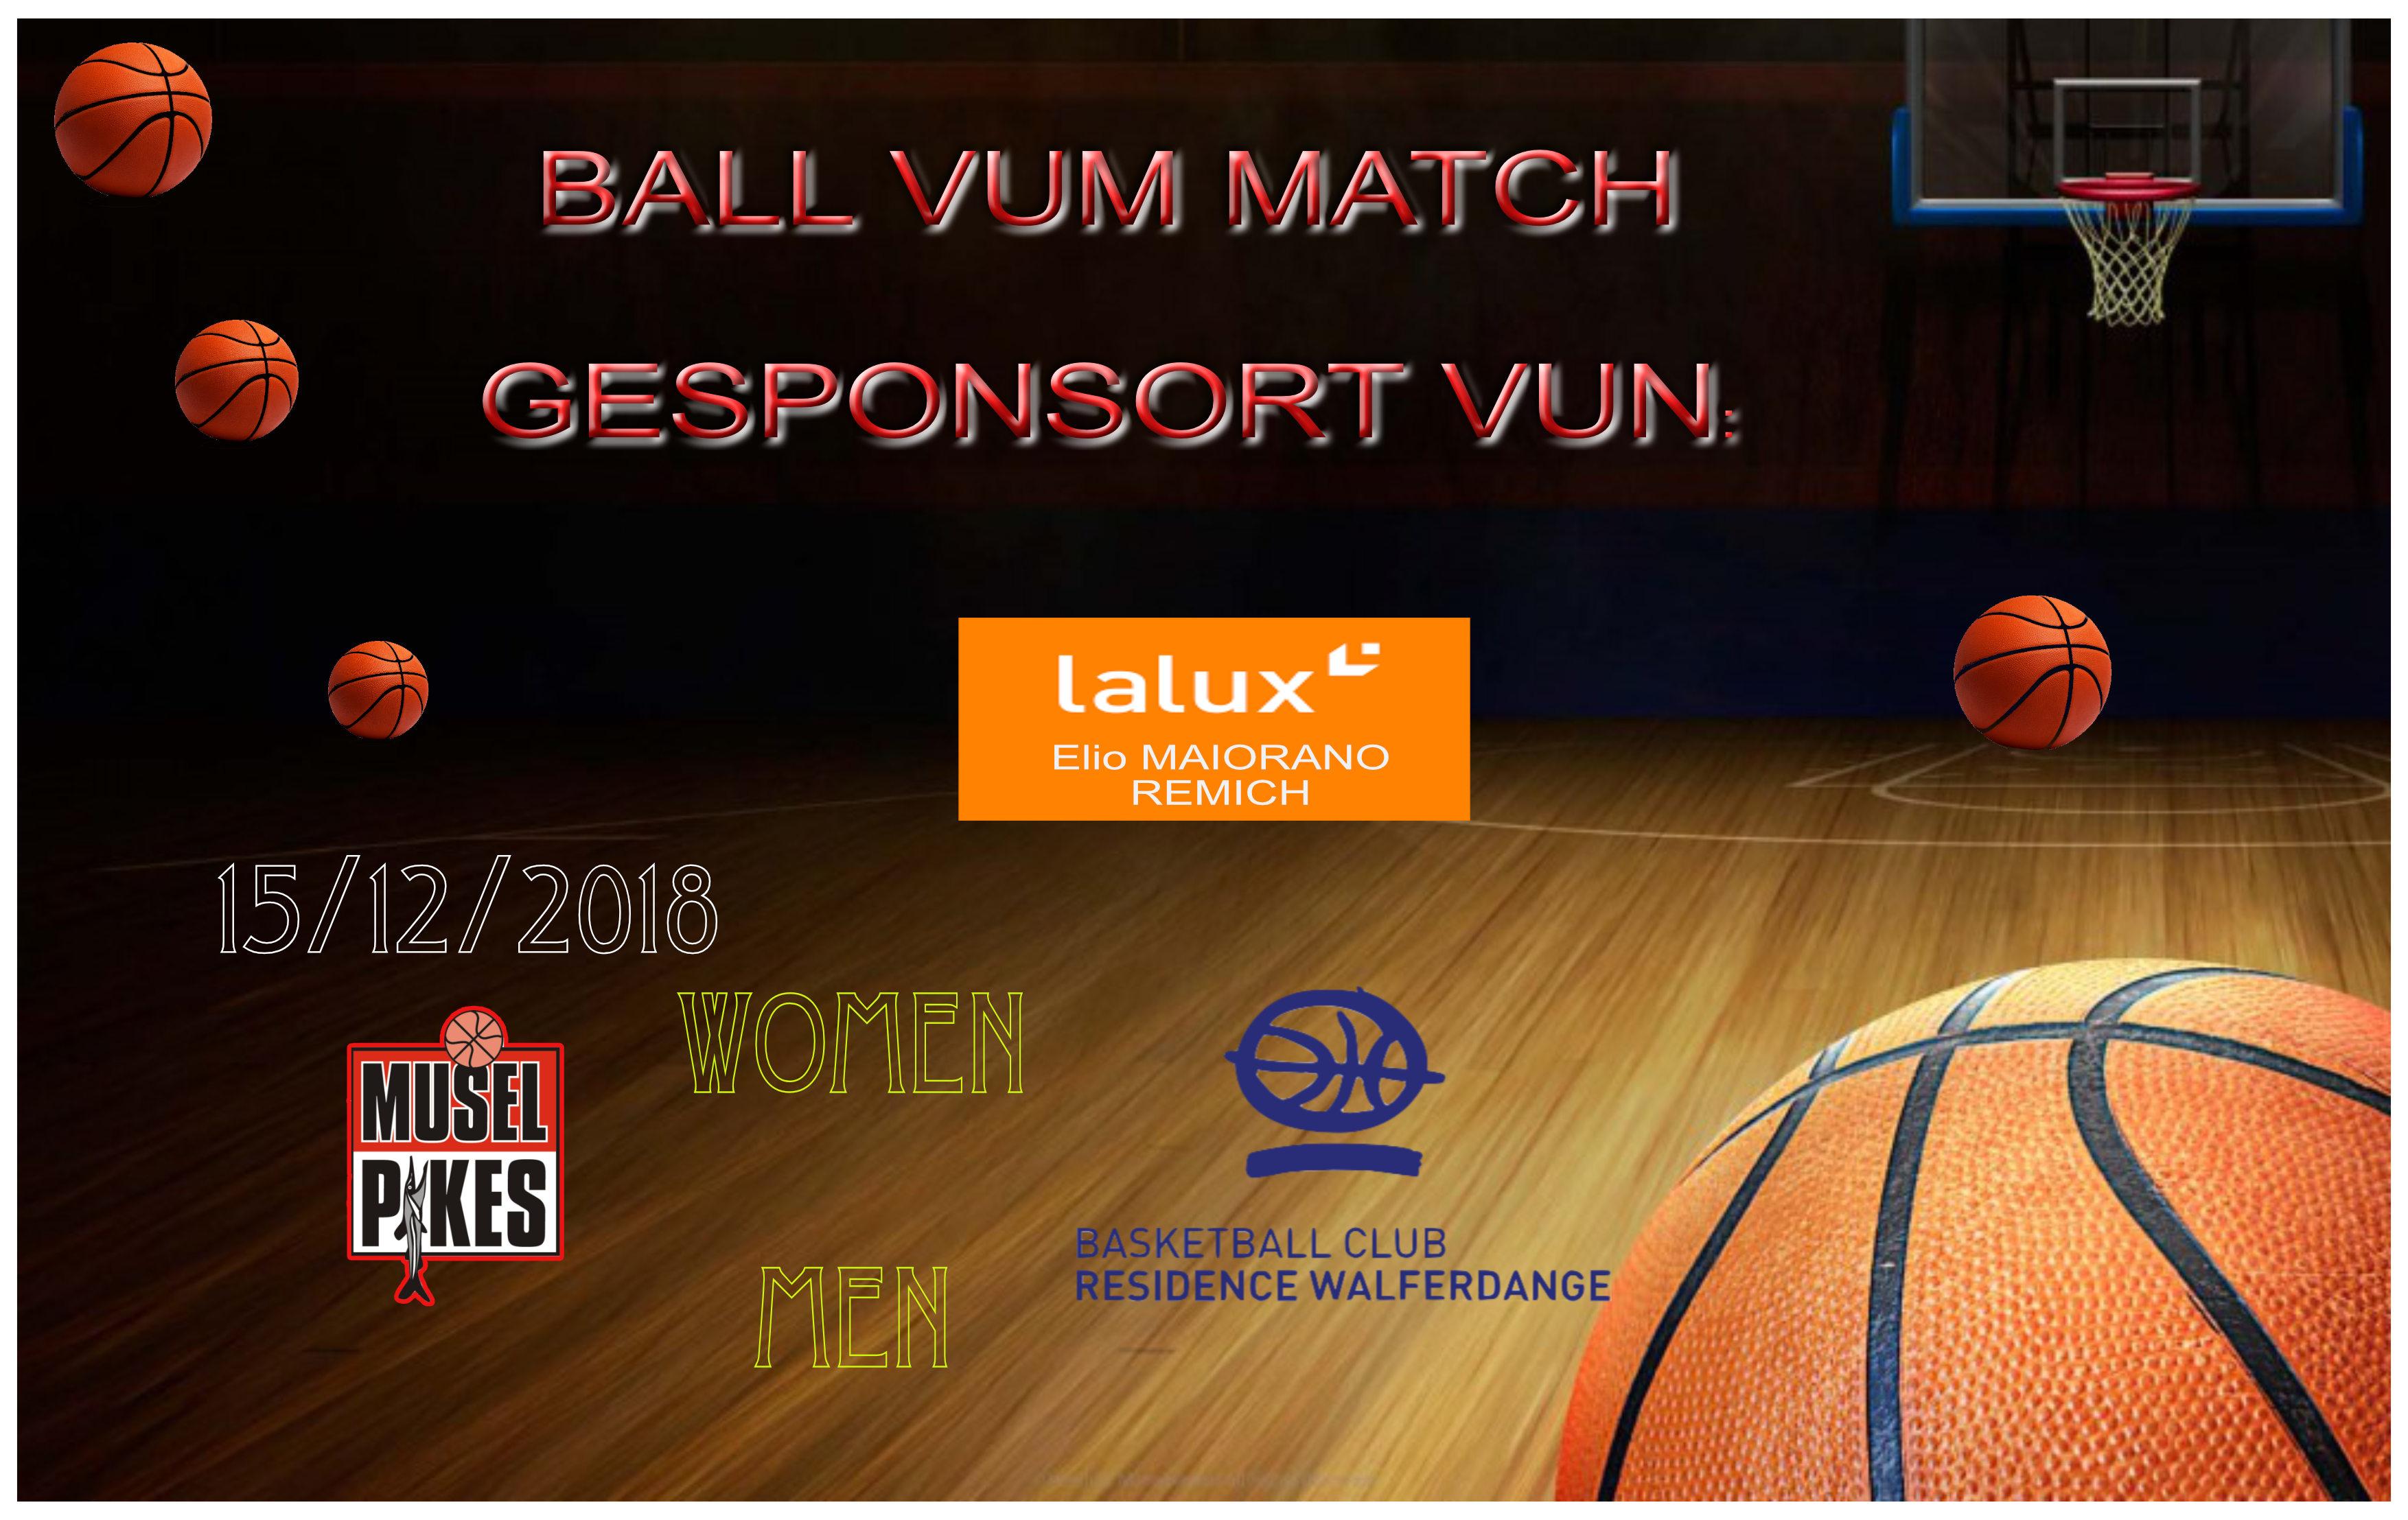 Den Elio MAIORANO sponsort de Ball Vum Match